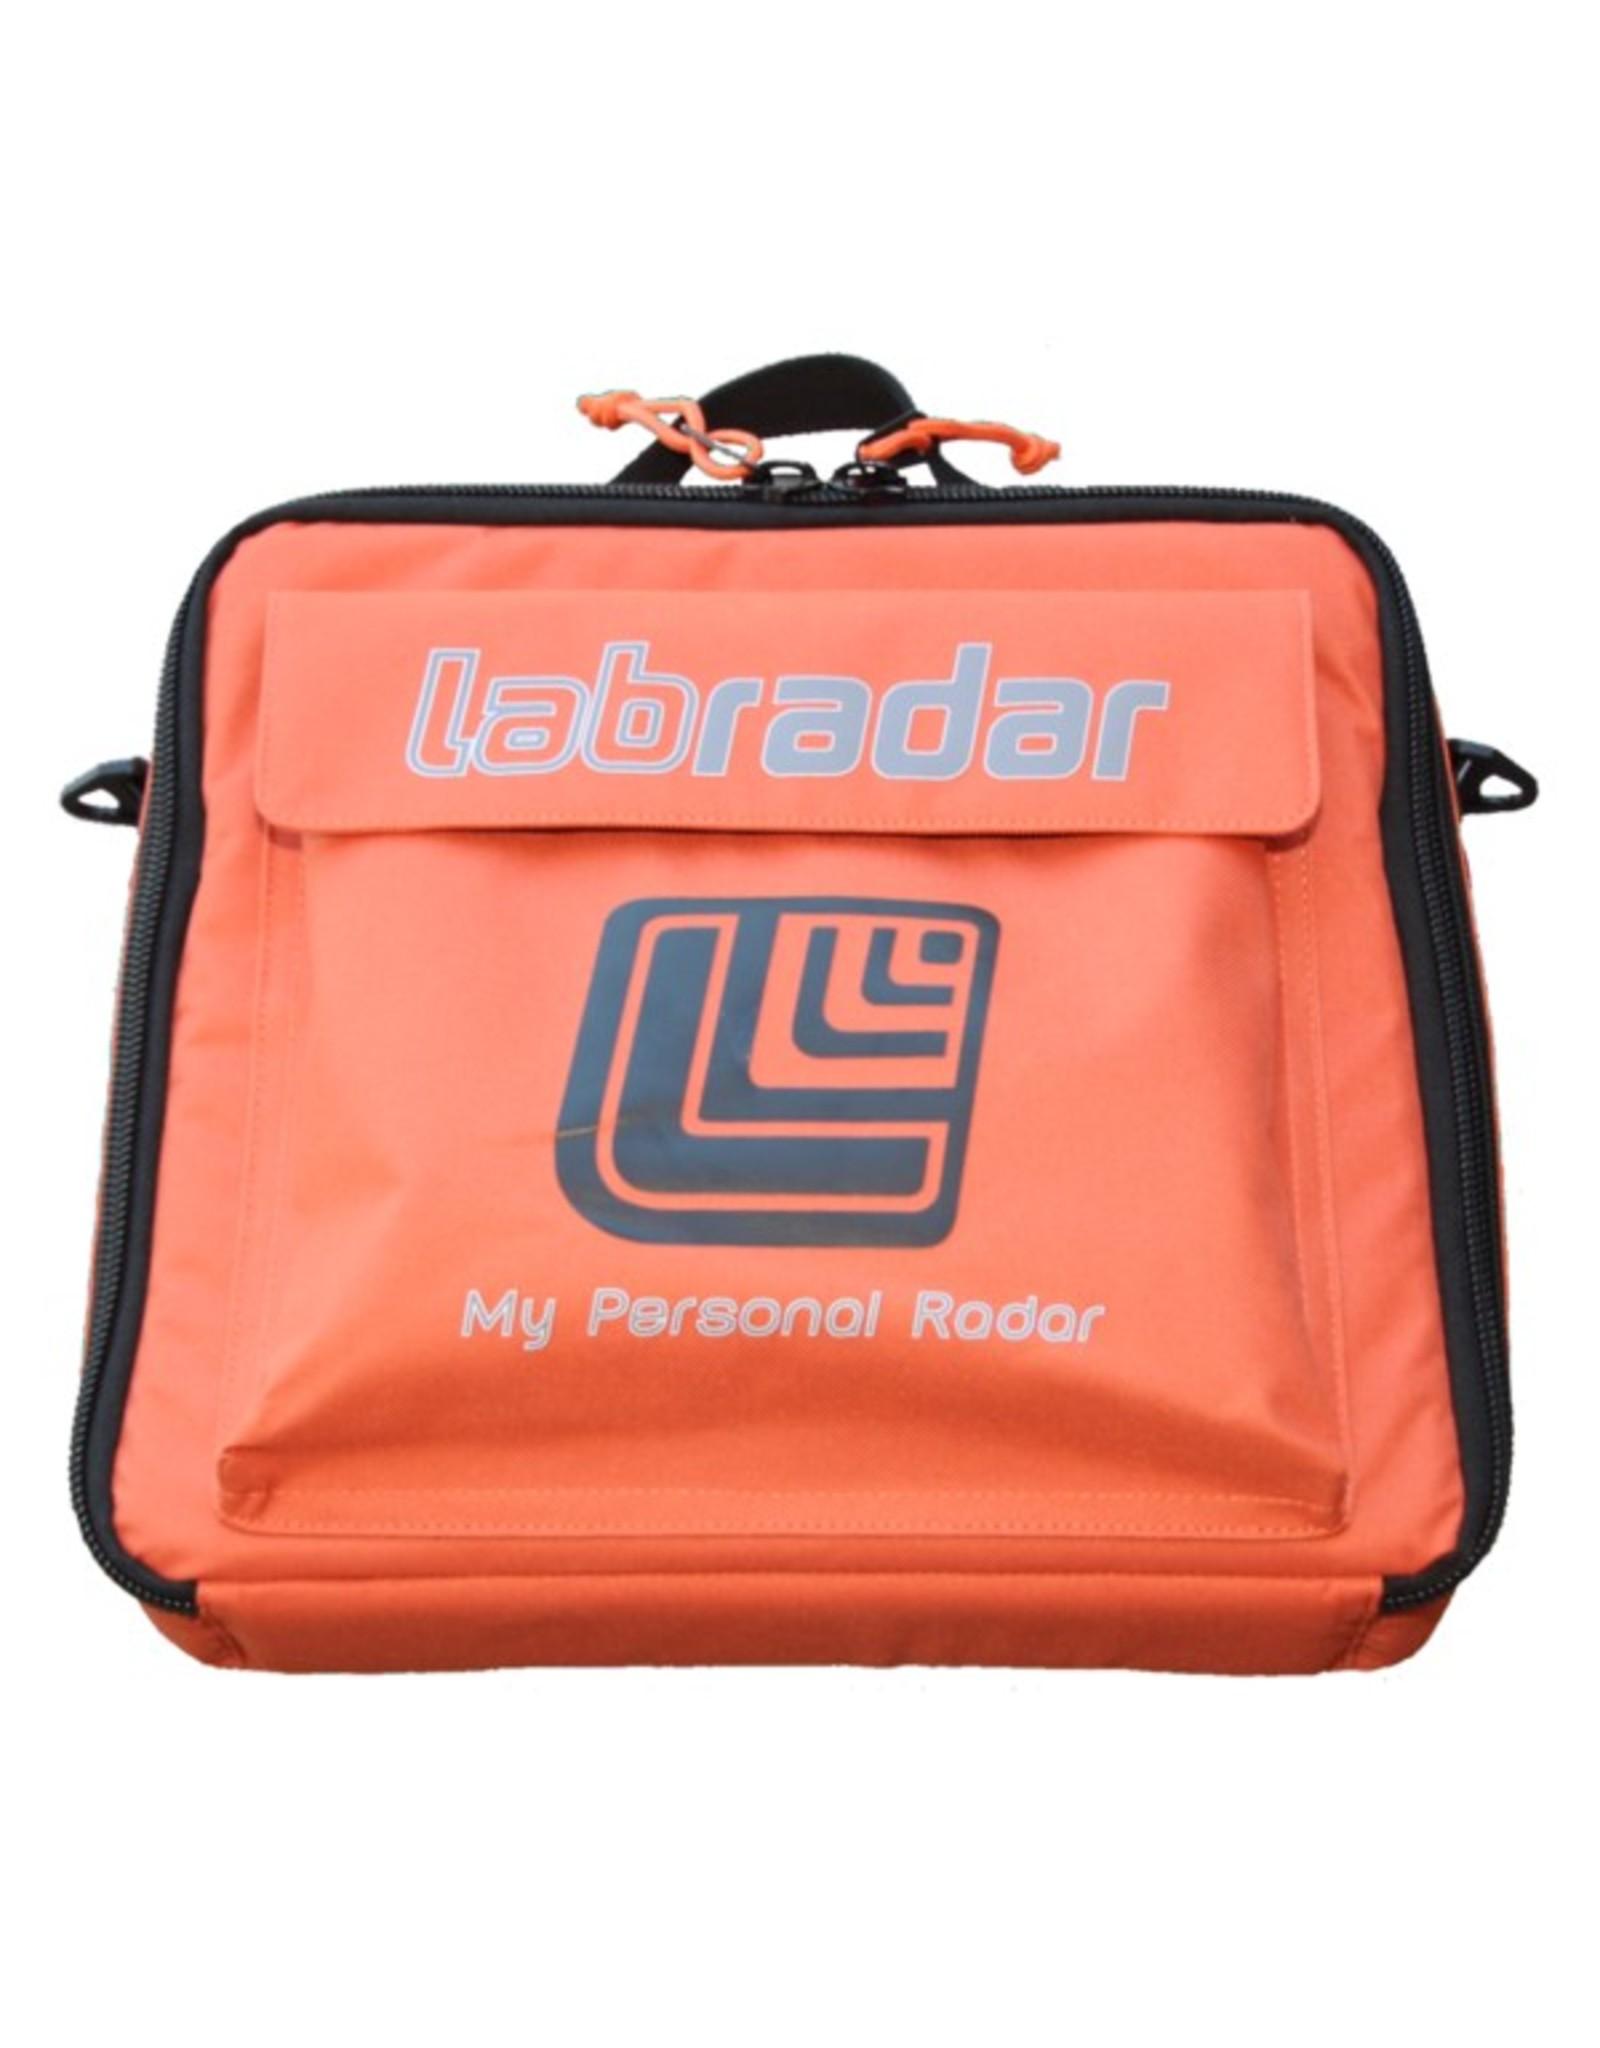 LabRadar LabRadar - Padded Carrying Case